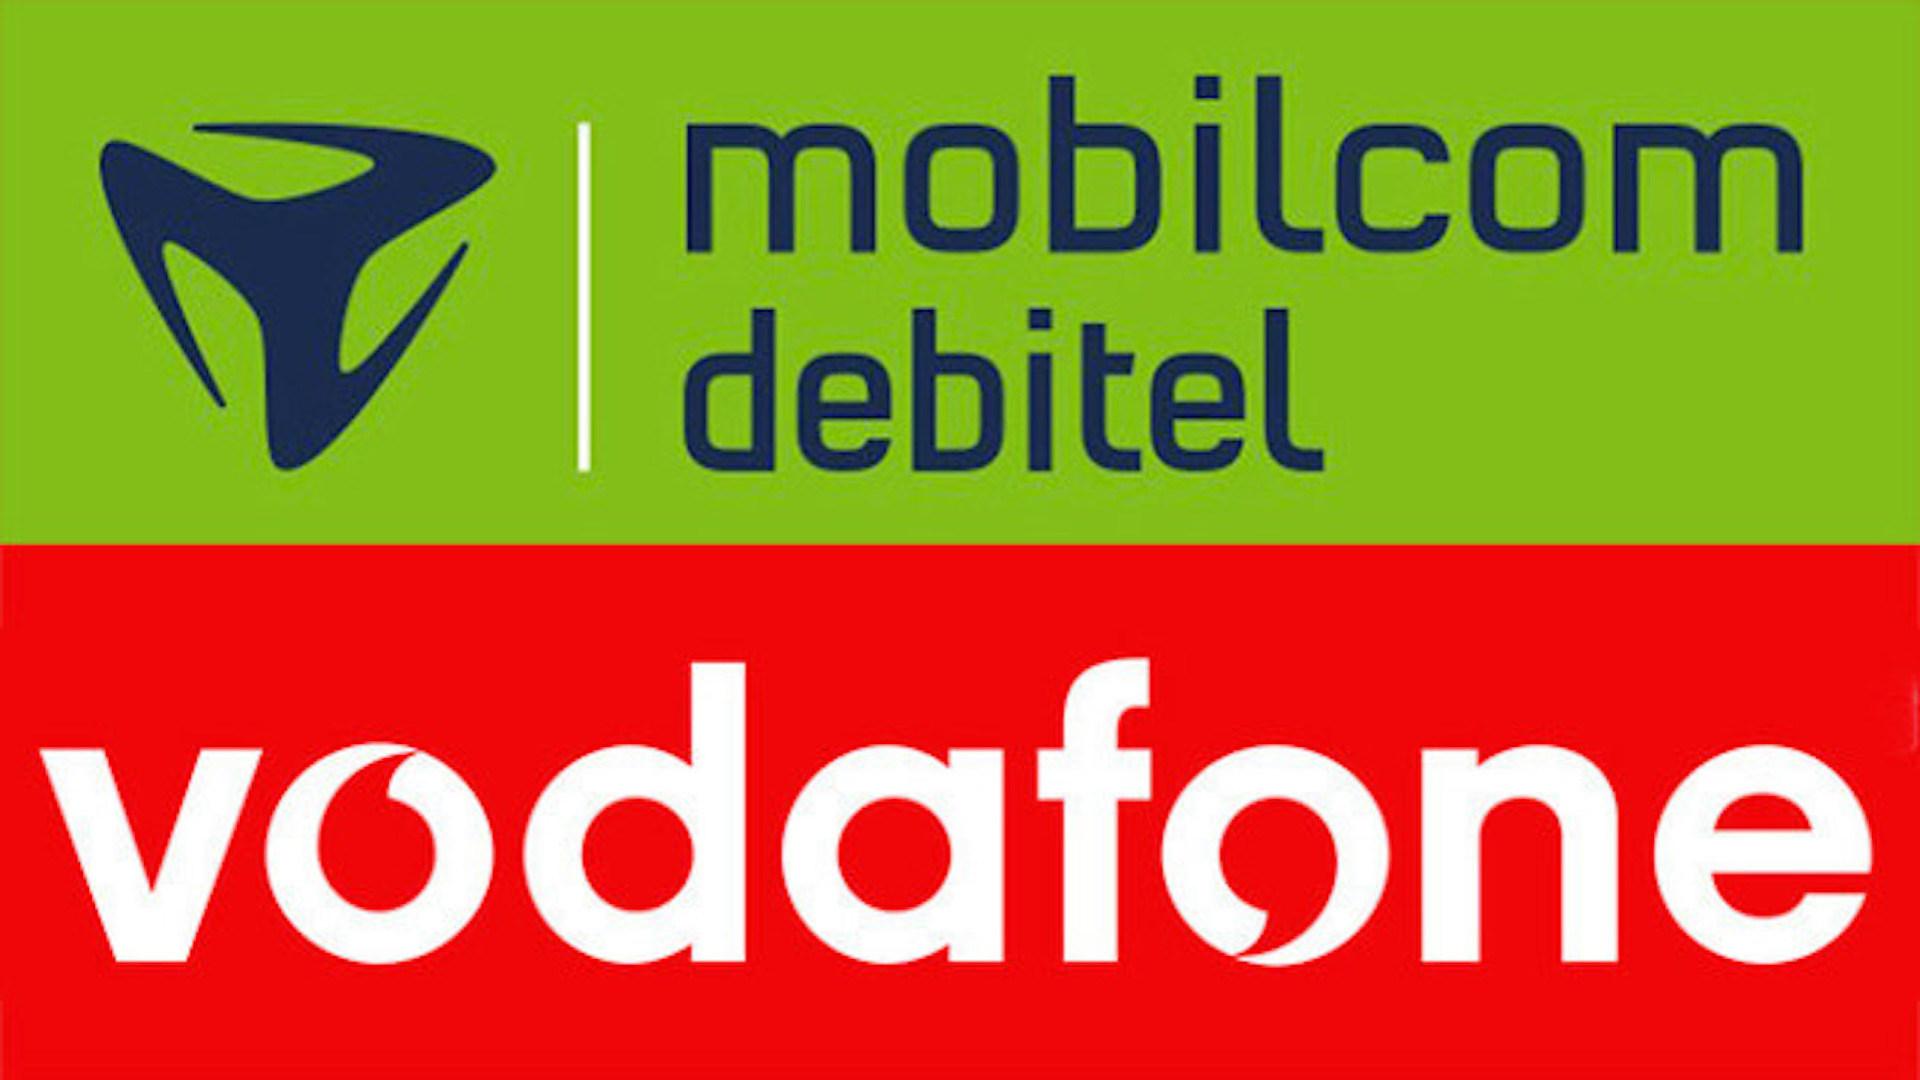 Mobilfunk, Rabattaktion, Vodafone, Tarife, Sim, Mobilcom Debitel